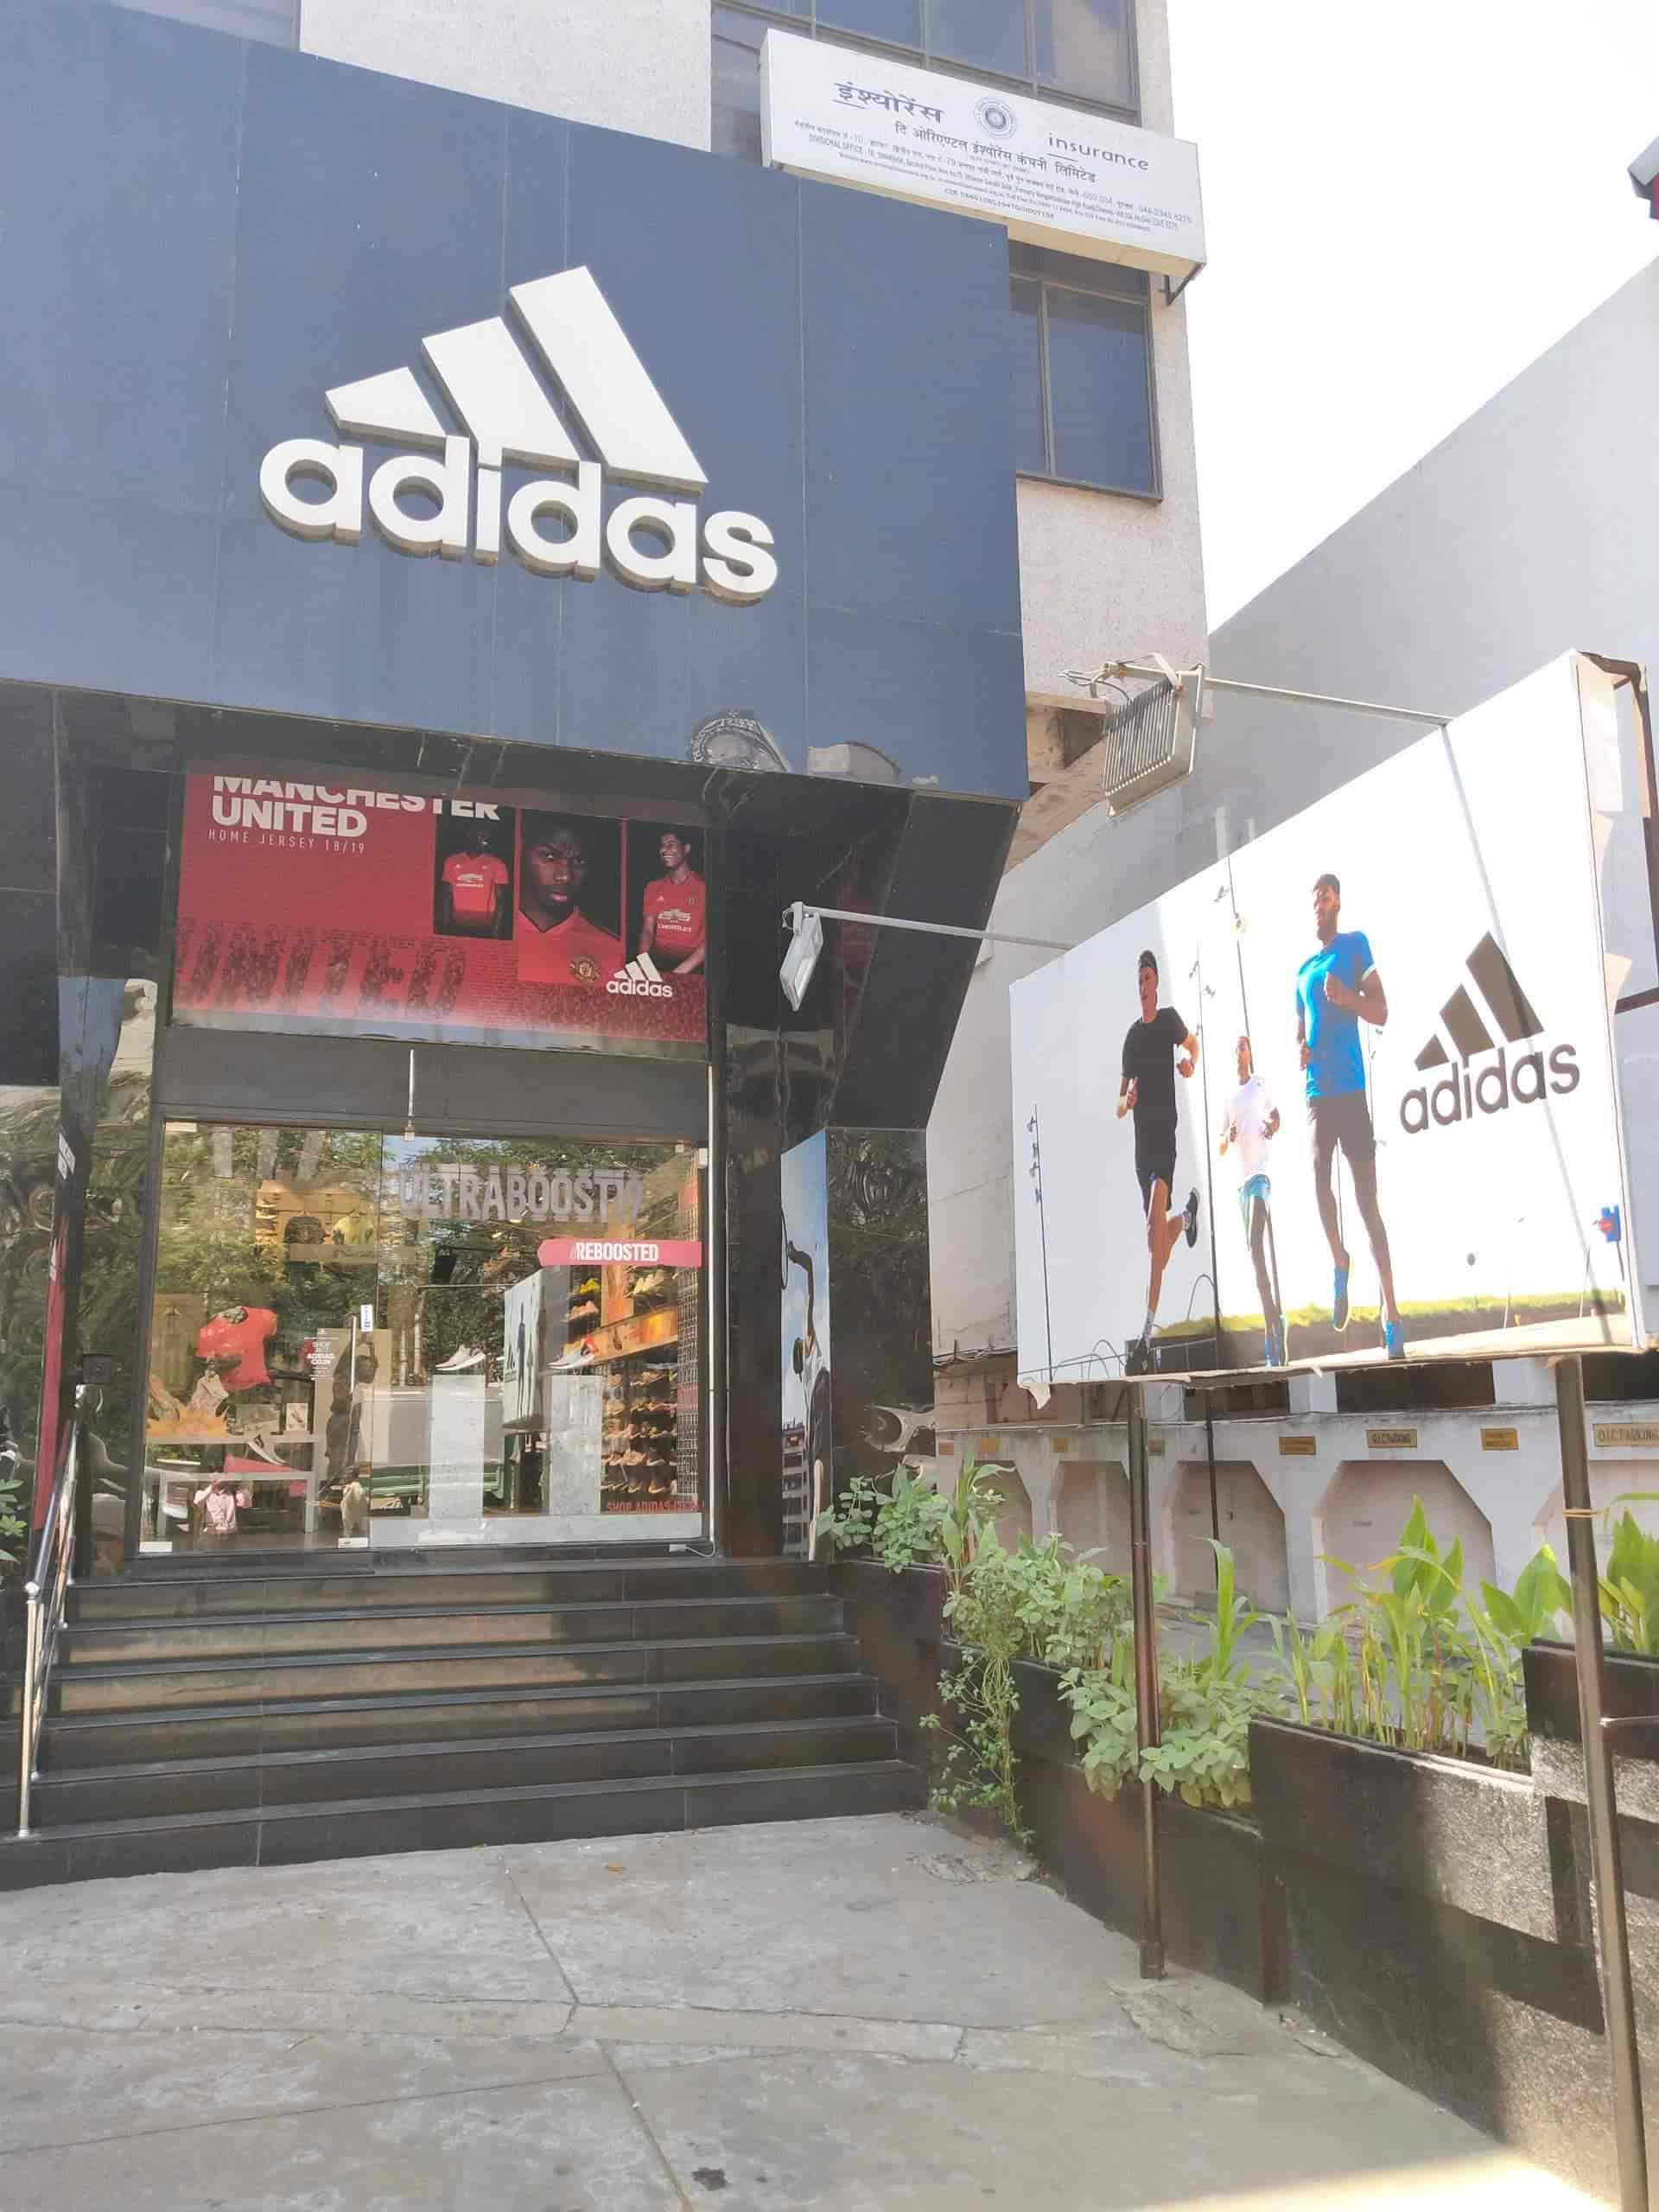 Adidas Originals Sportswear Retailers